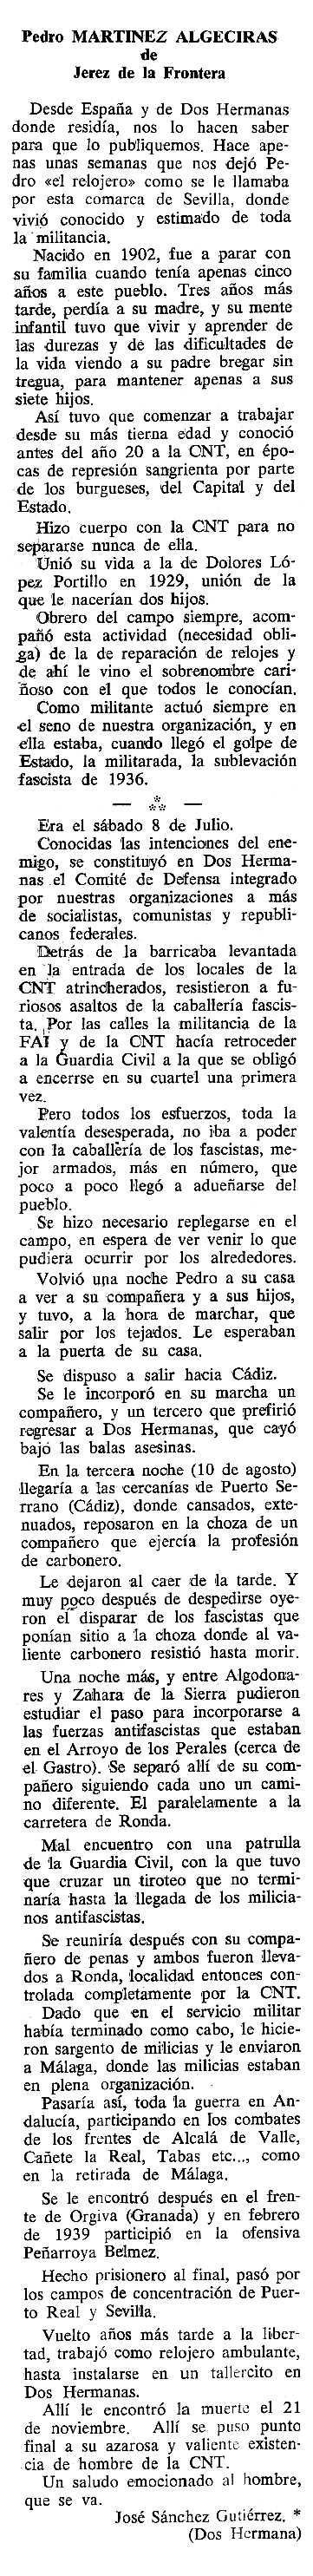 "Necrològica de Pedro Martínez Algeciras apareguda en el periòdic tolosà ""Cenit"" del 18 d'abril de 1989"